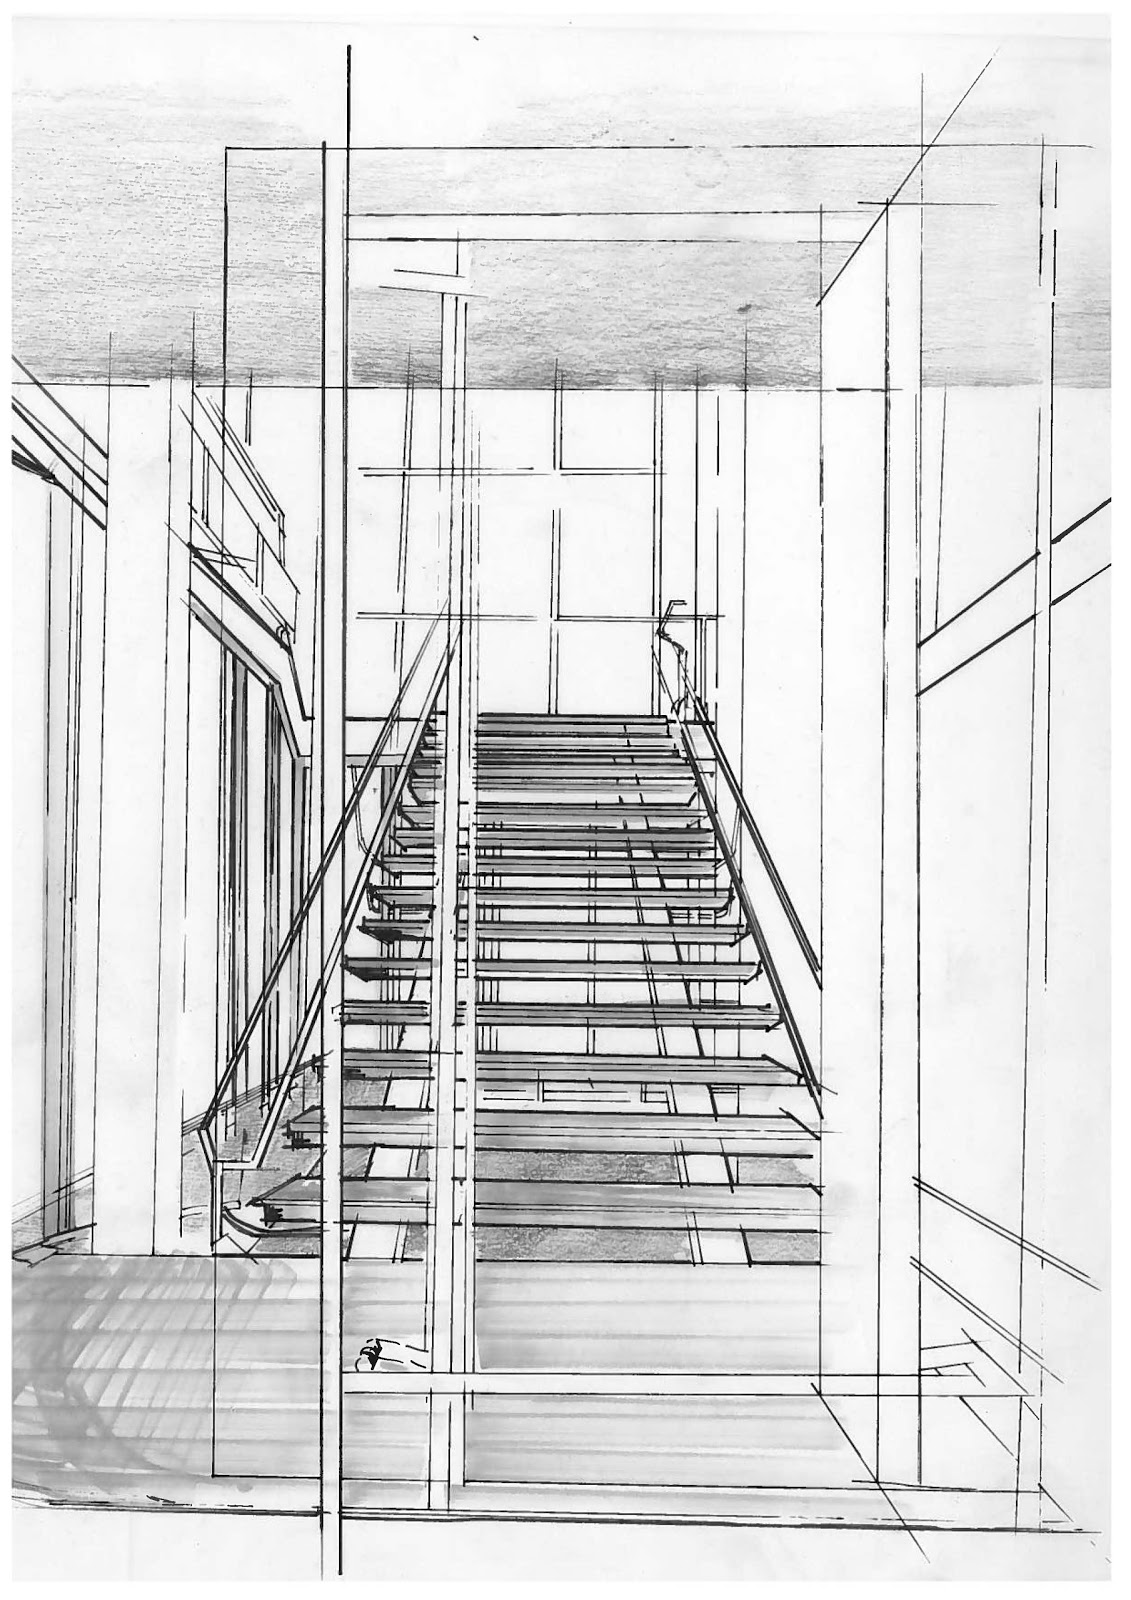 100 Best Corridors Stairs Lighting Images By John: La Maison De Verre: Main Staircase